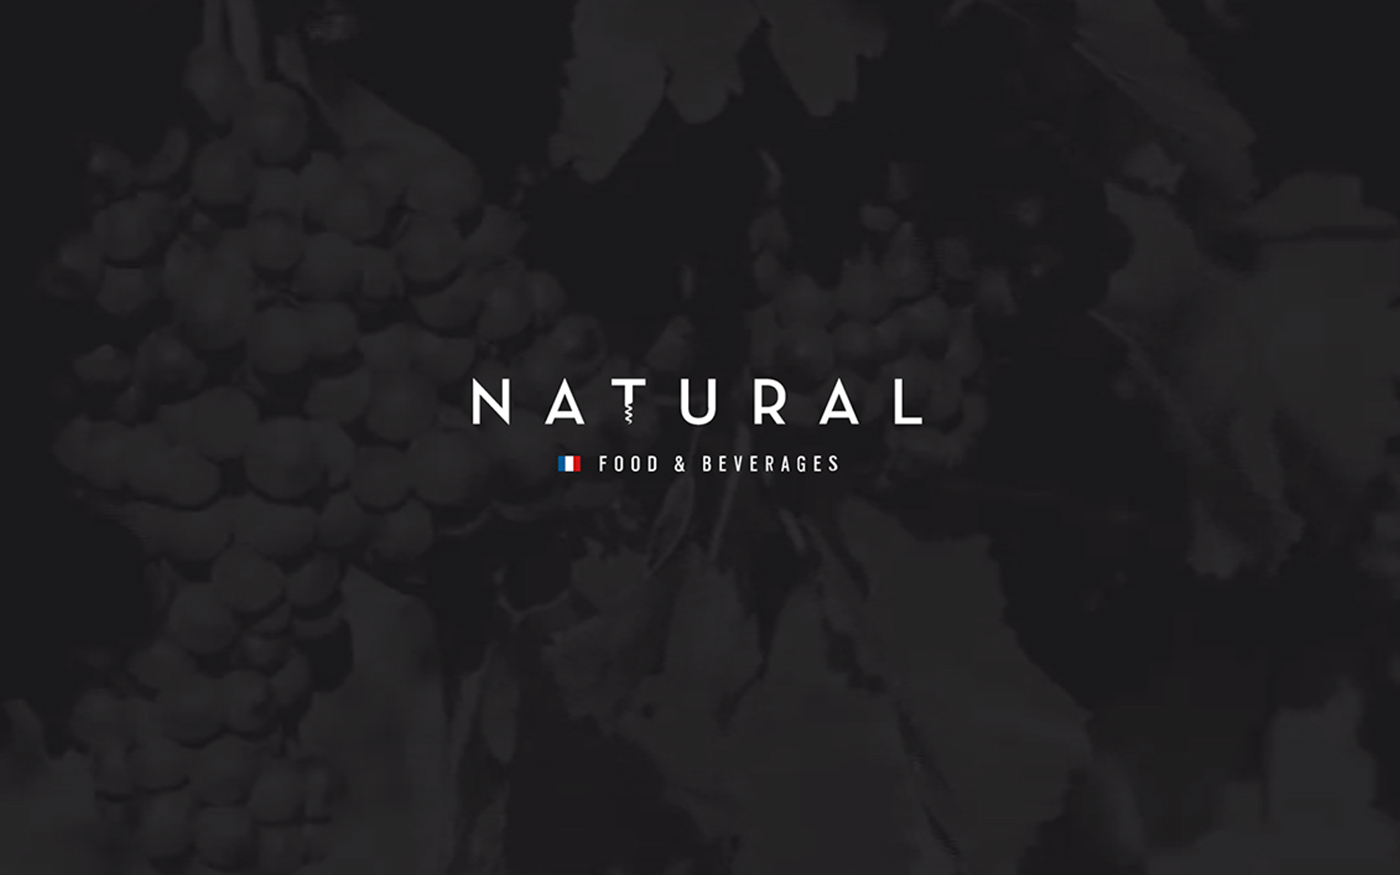 Natural FnB